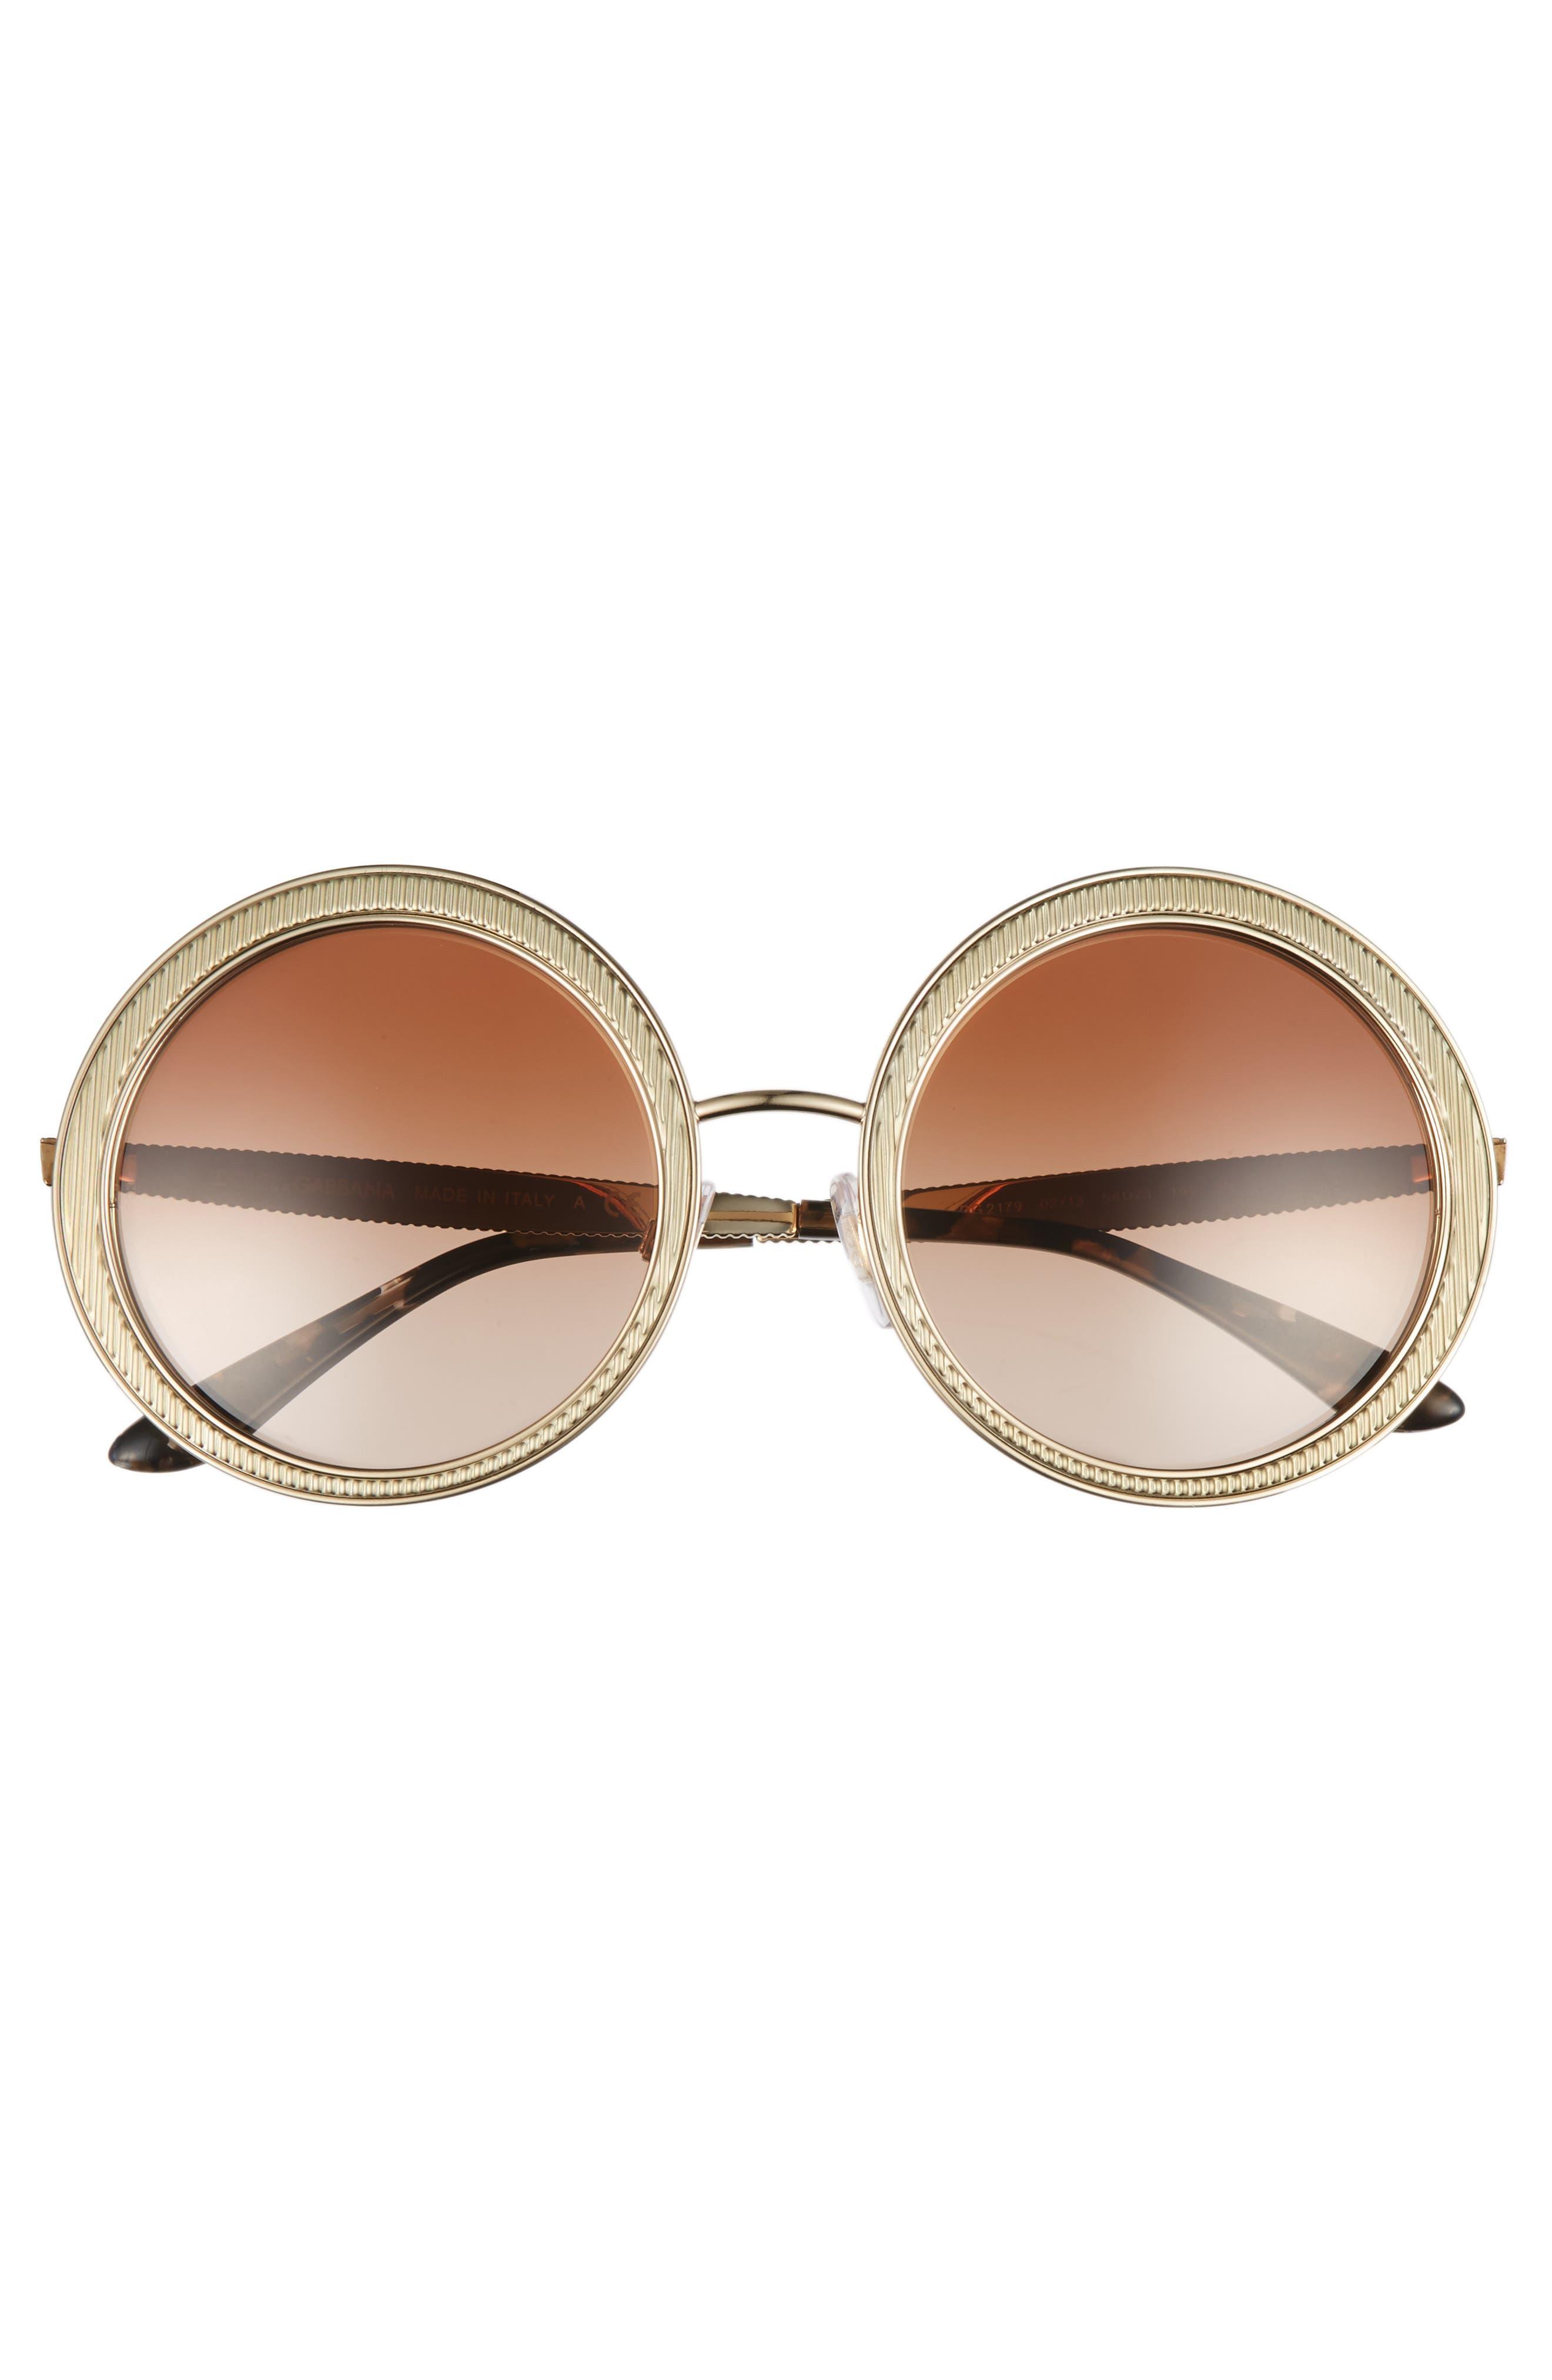 54mm Gradient Round Sunglasses,                             Alternate thumbnail 7, color,